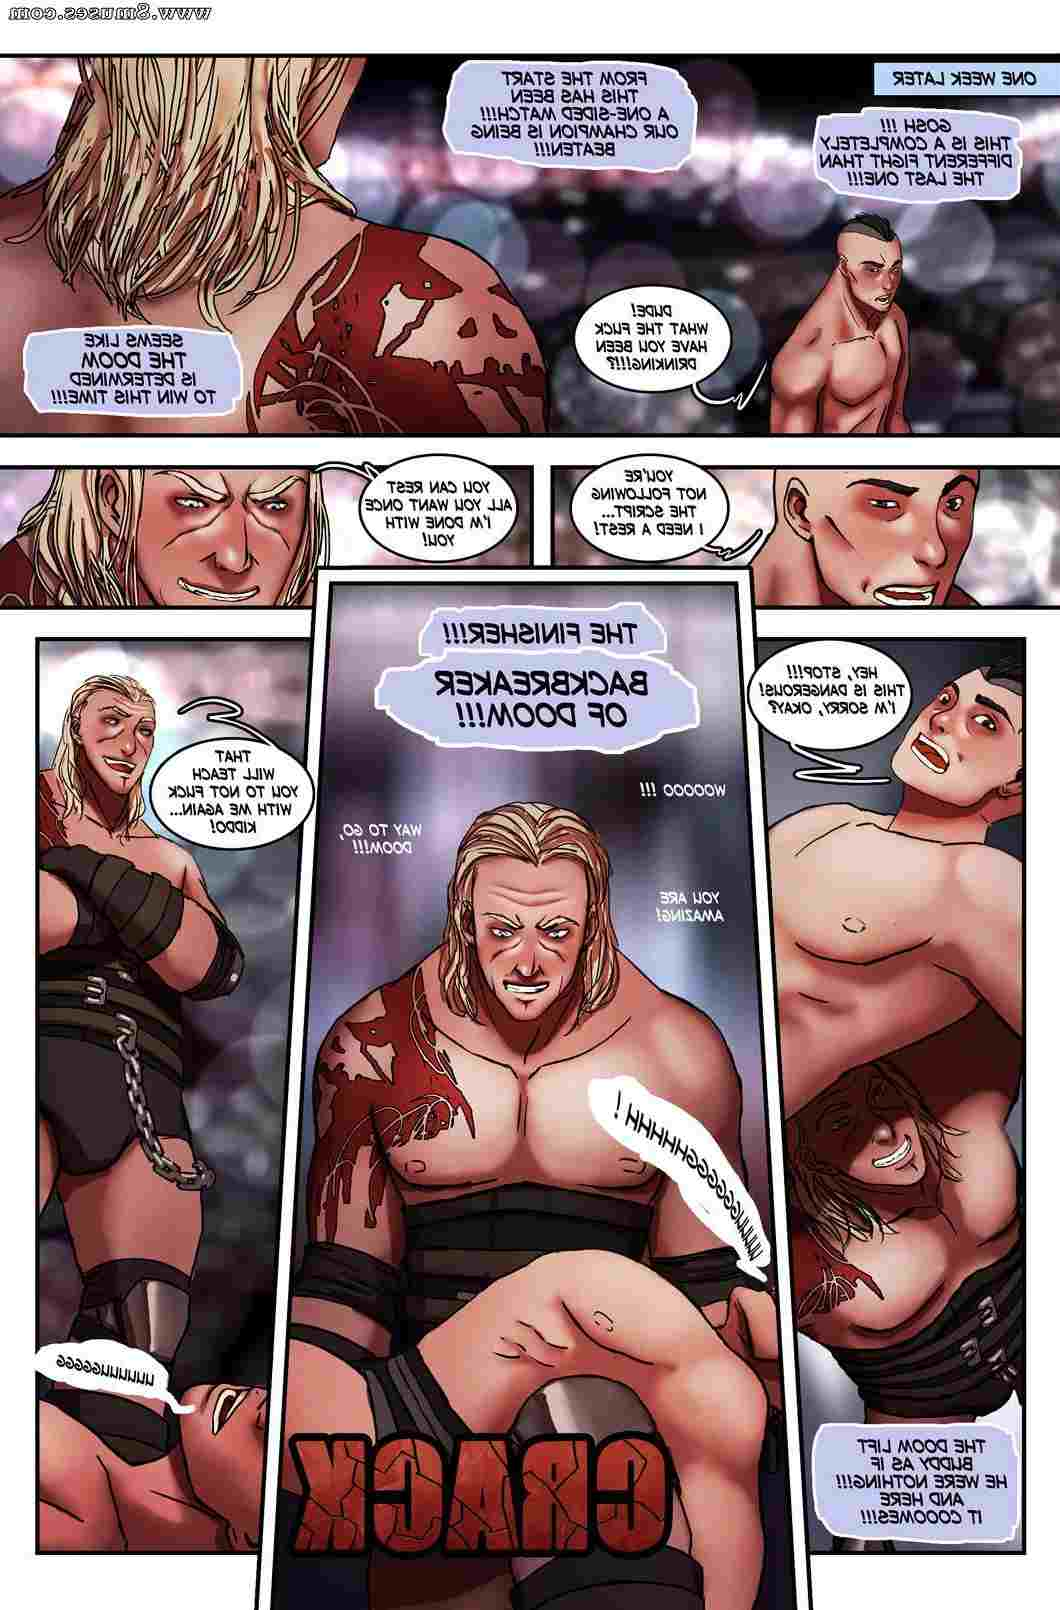 TG-Comics/Kannel/The-Heel The_Heel__8muses_-_Sex_and_Porn_Comics_3.jpg